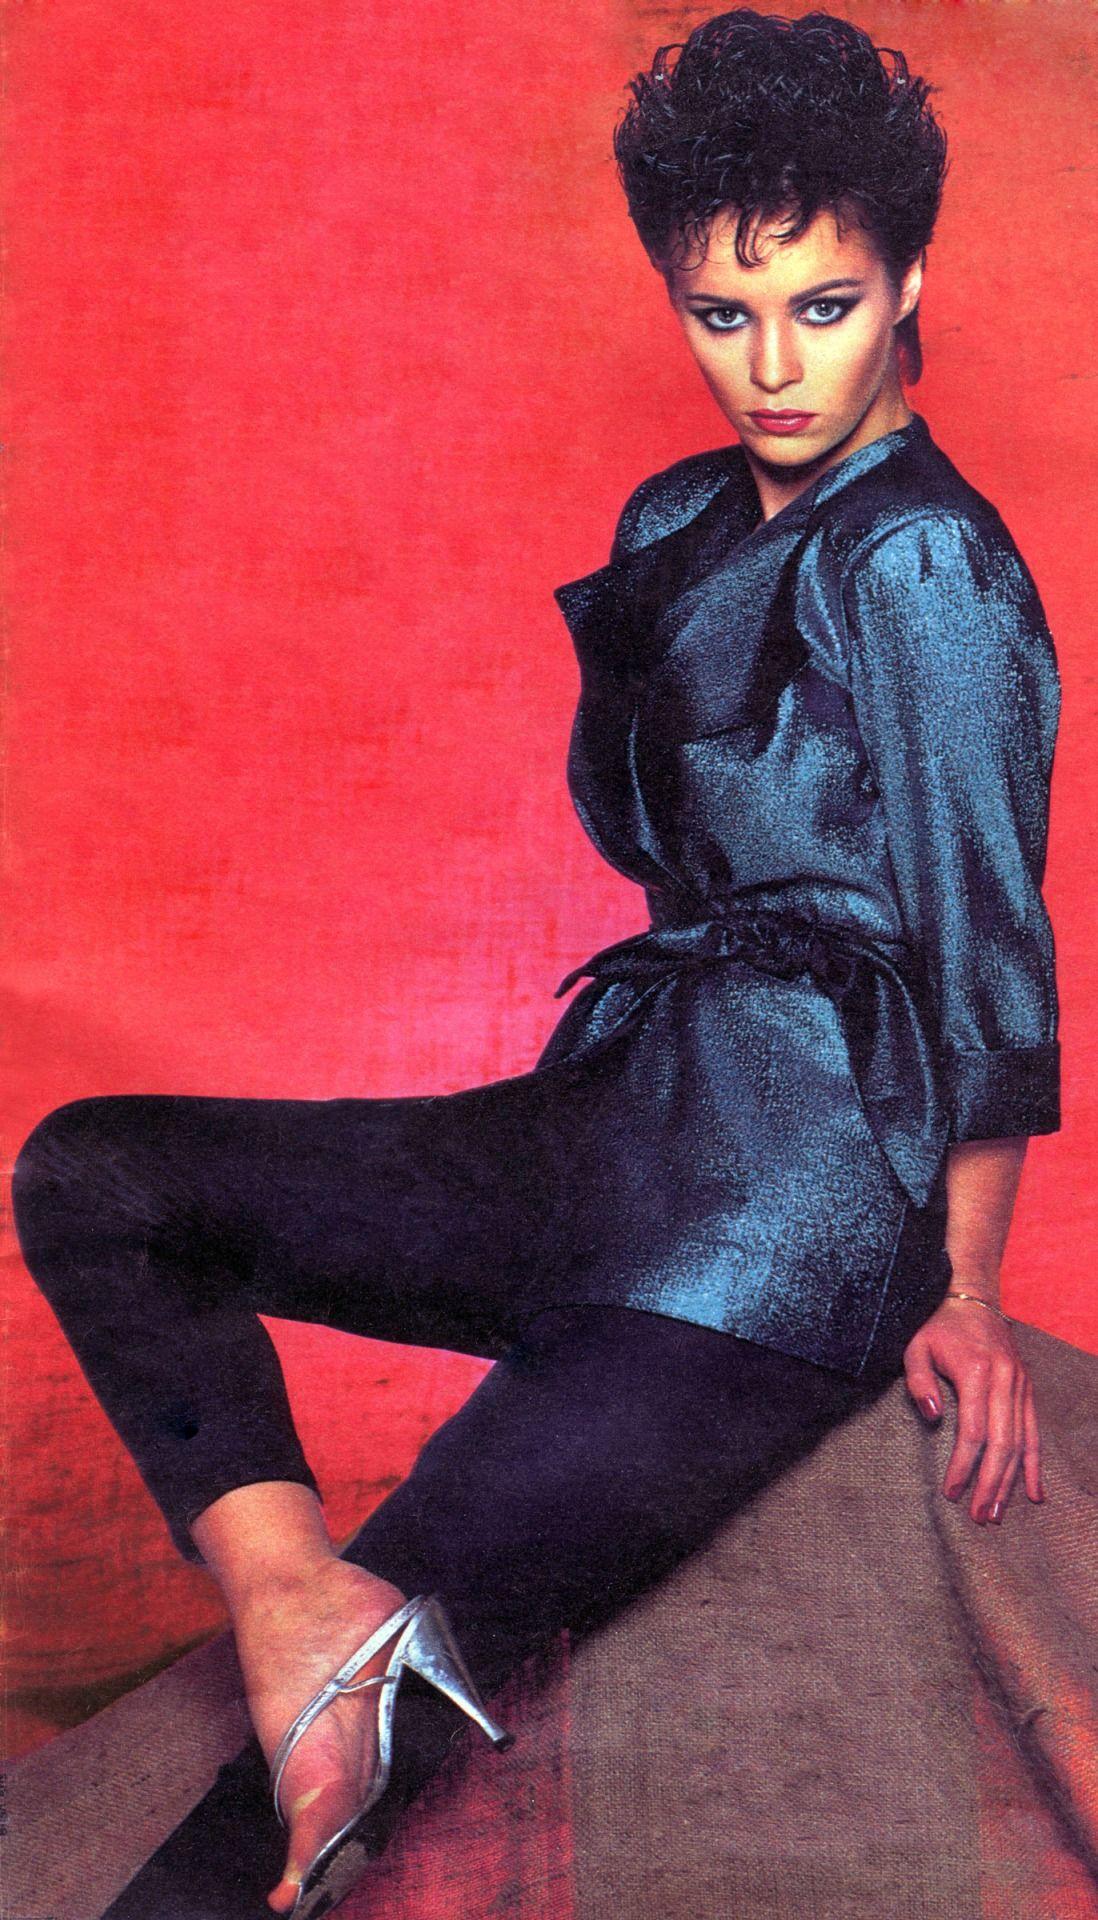 Penny Fuller Erotic pic June Palmer,Trishelle Cannatella